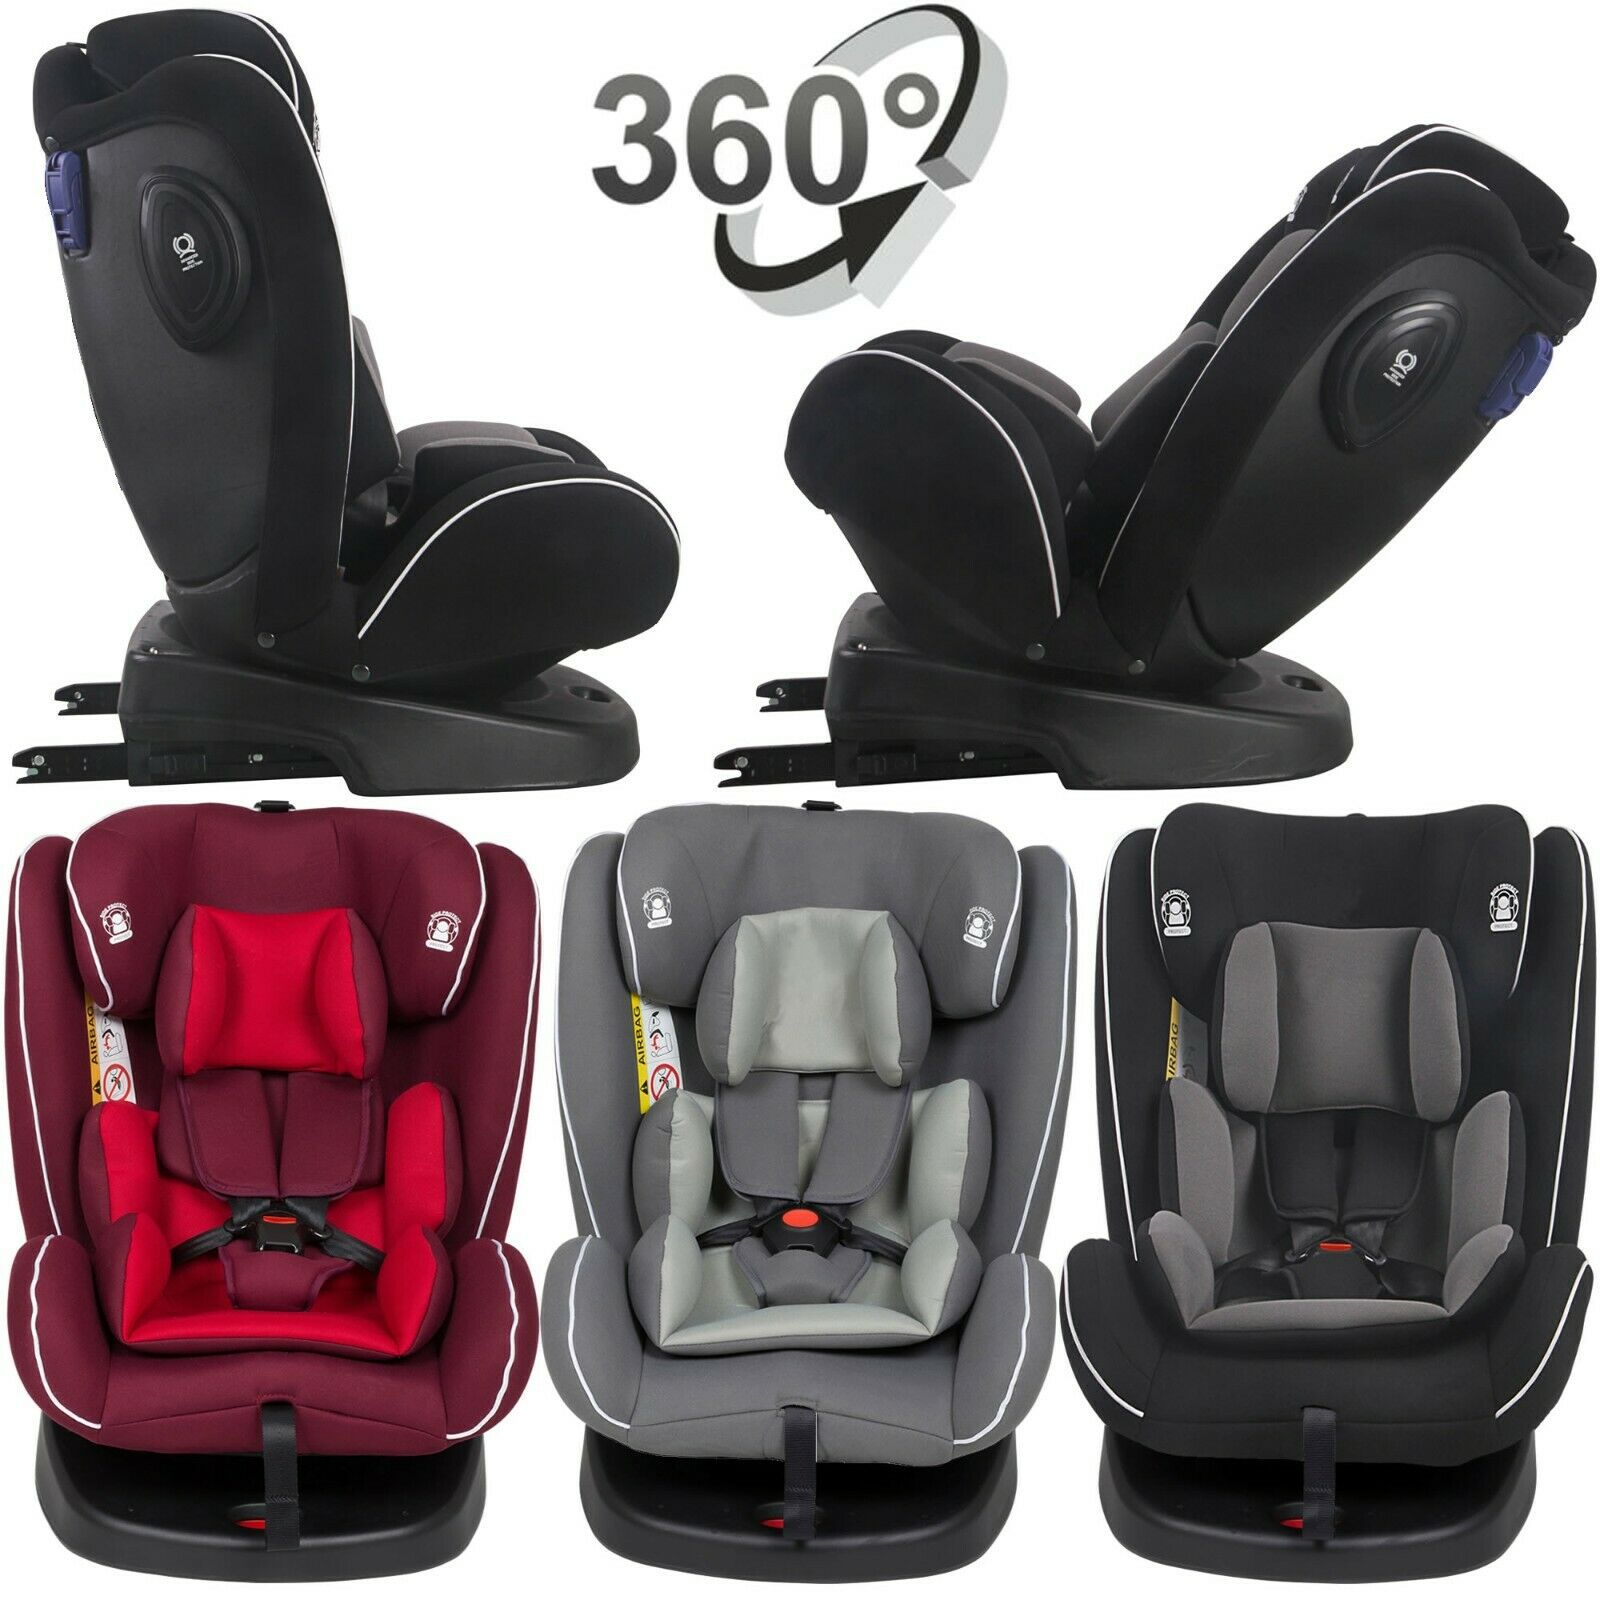 Autositz Kindersitz Isofix 0-36 kg Reboarder 360° Drehbar 0+1+2+3 Baby Sitz Avon